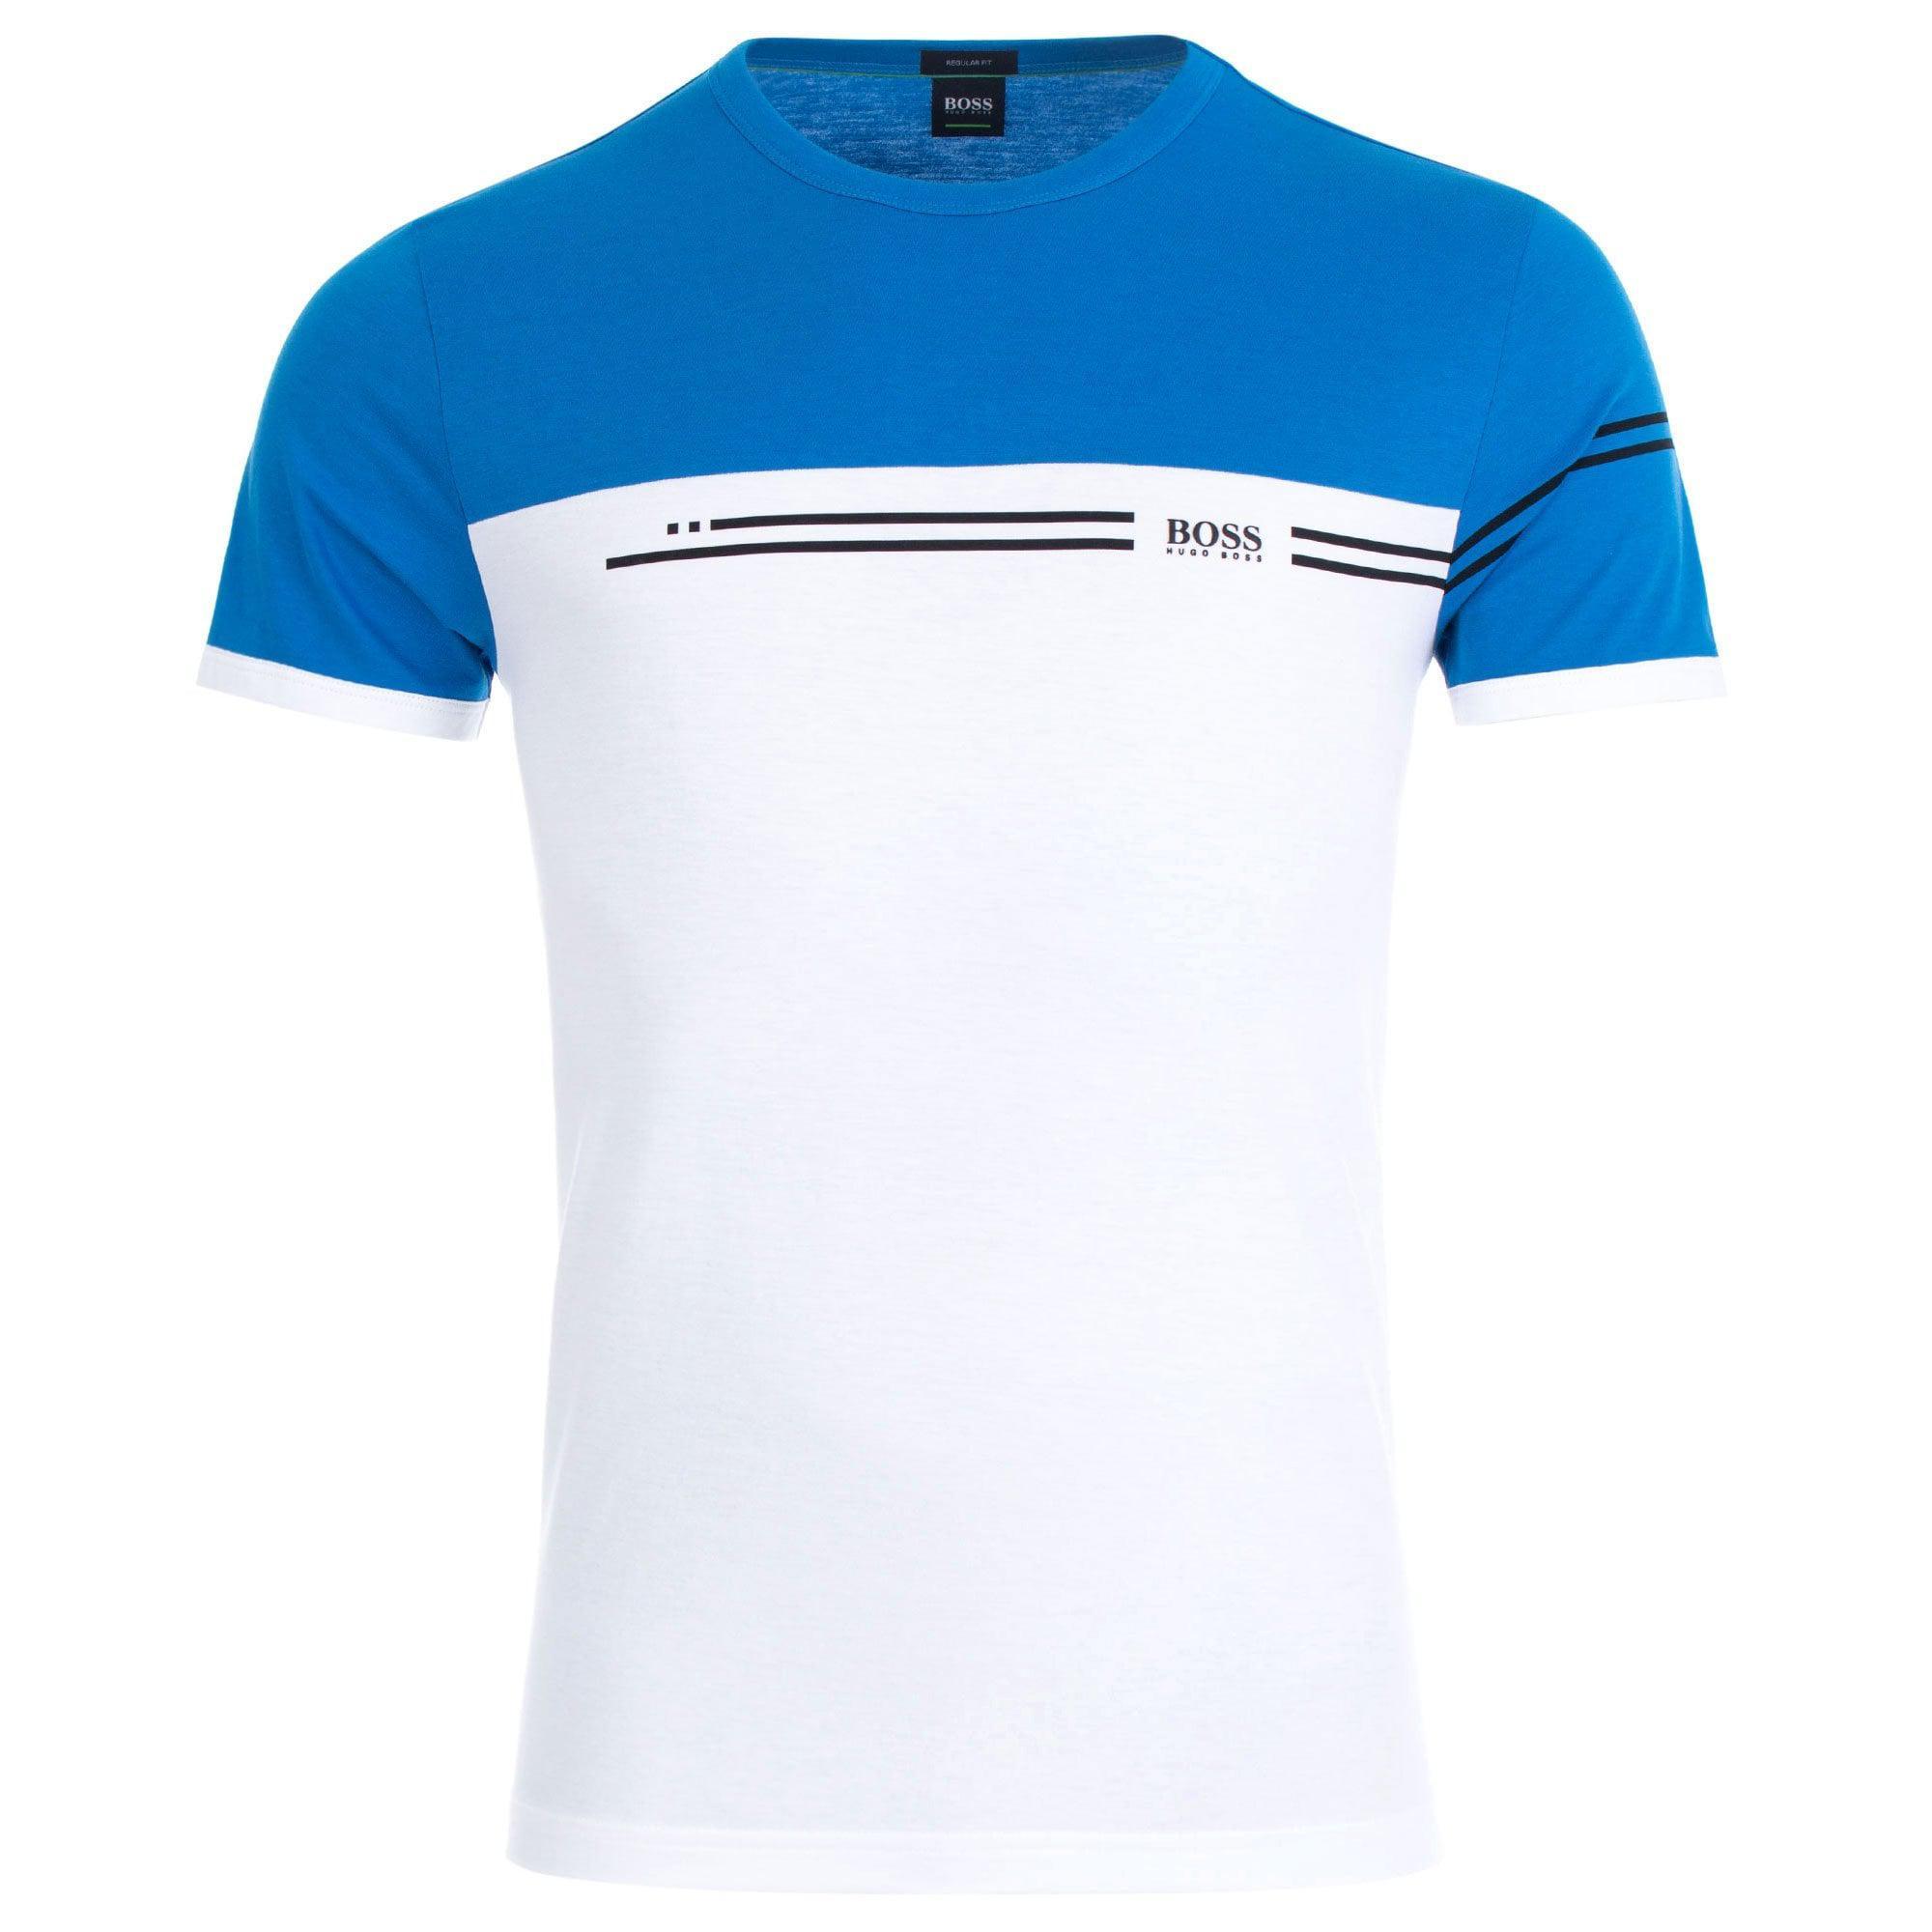 22798a9b8 BOSS Athleisure Colour Block Logo T-shirt in Blue for Men - Lyst